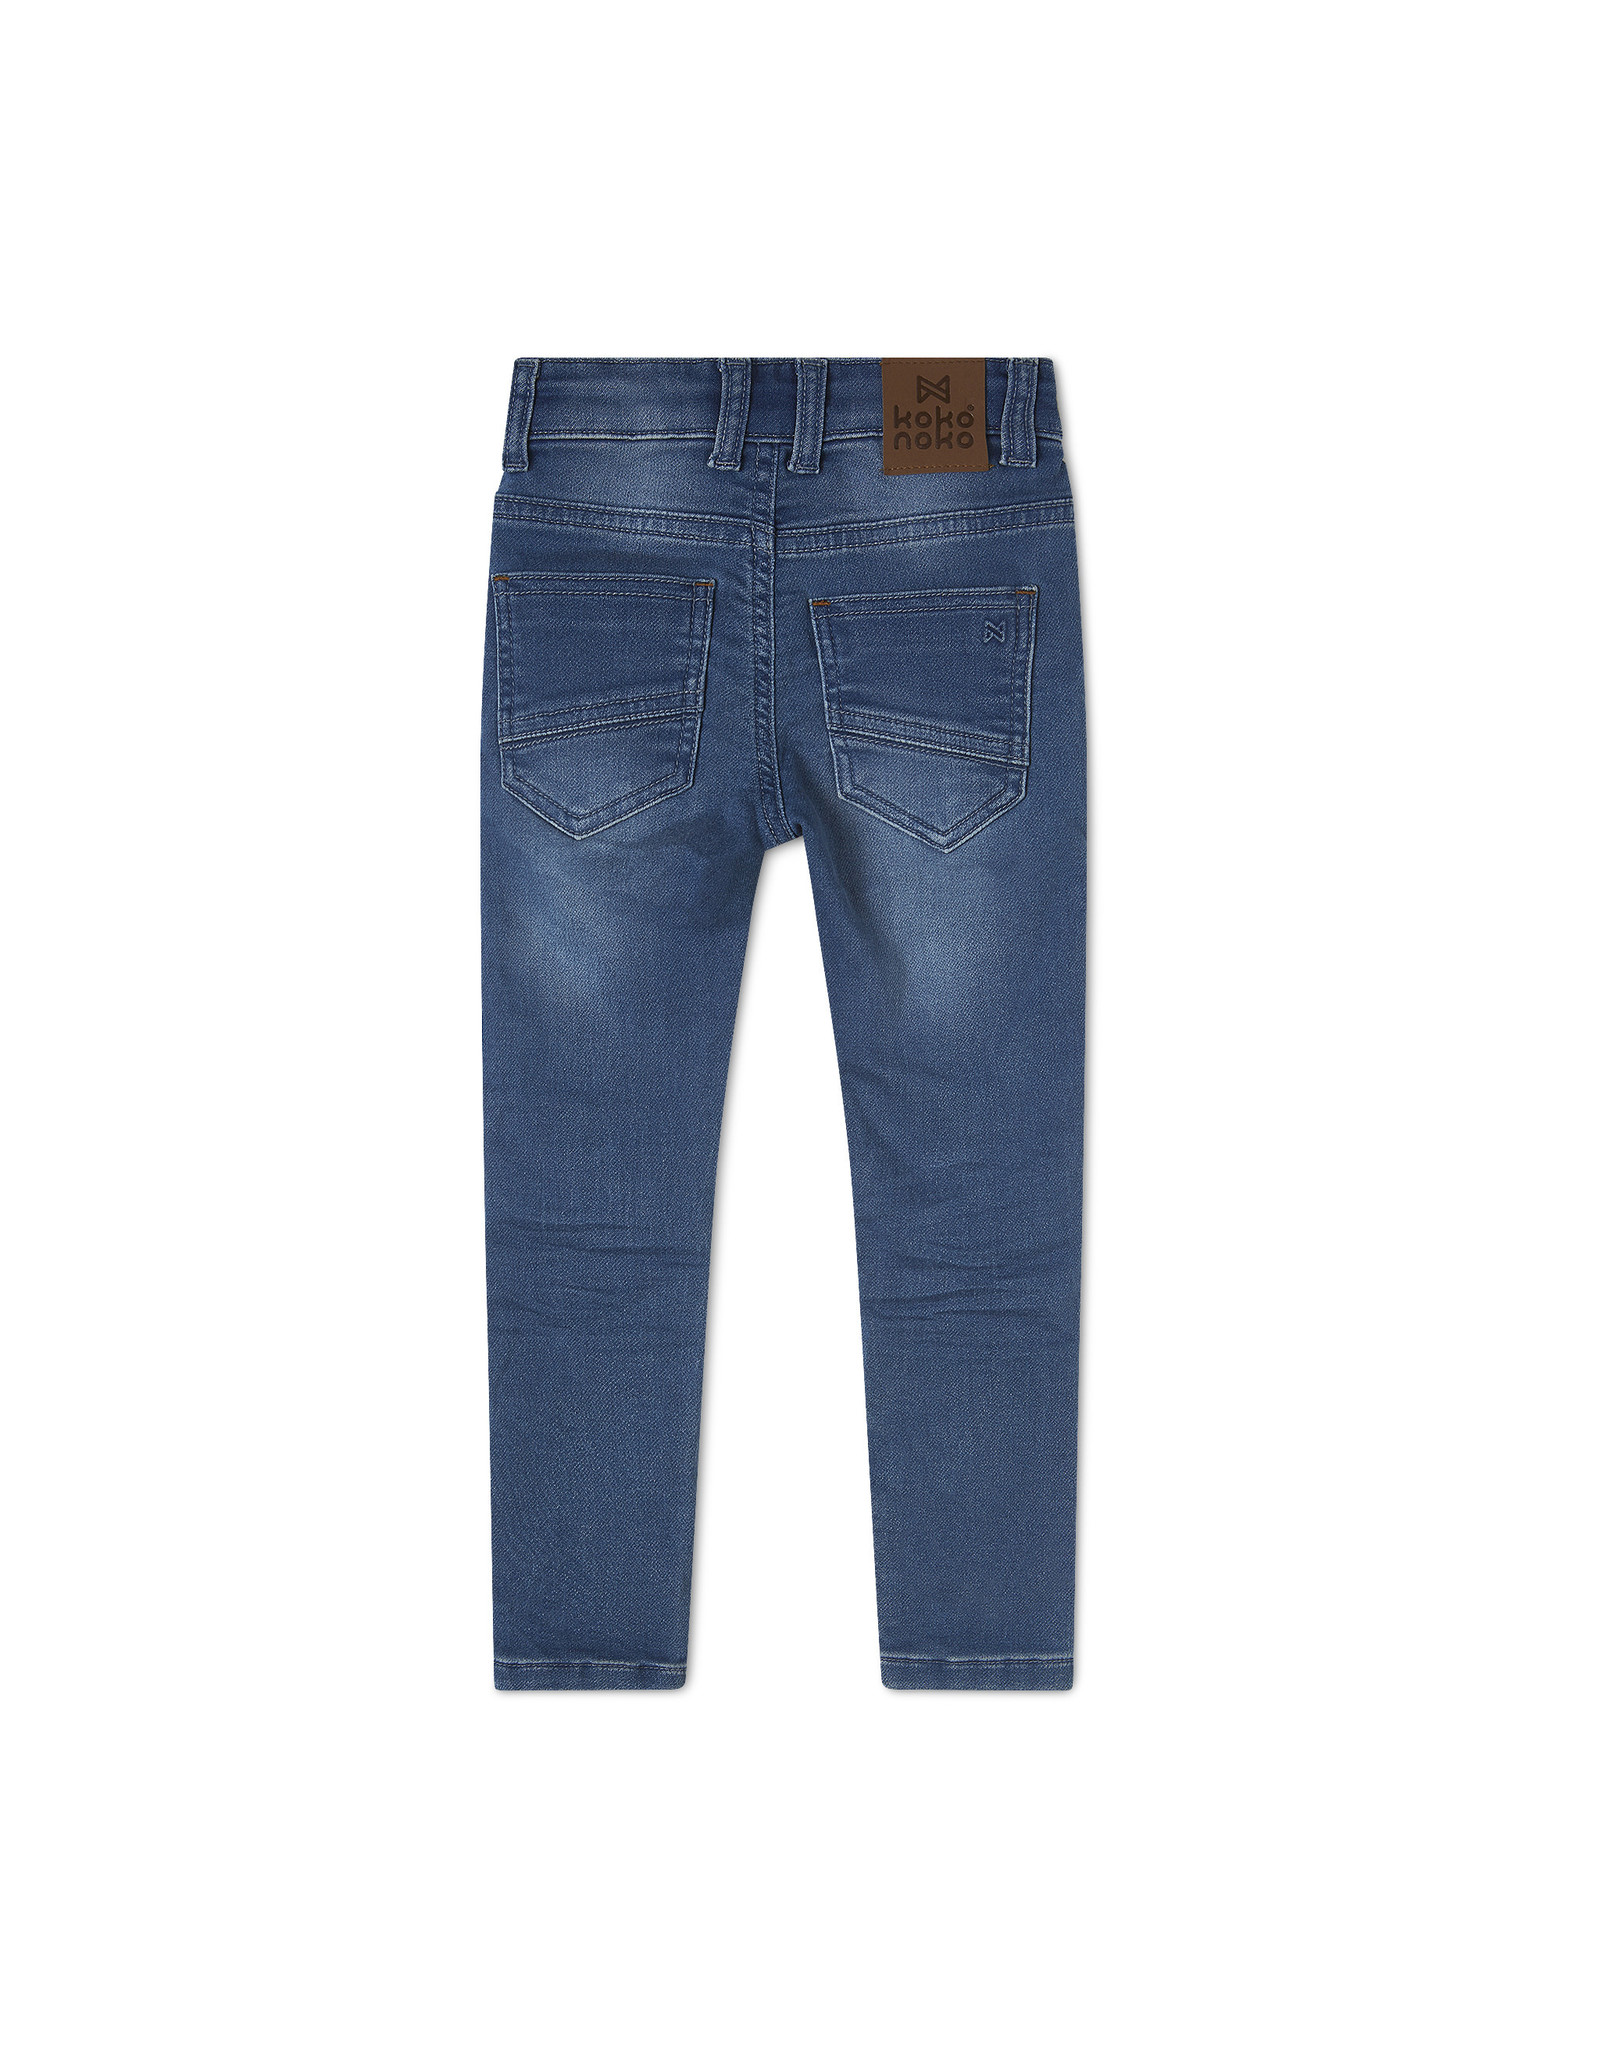 Koko Noko Boys Novan jeans knit Bluejeans NOS